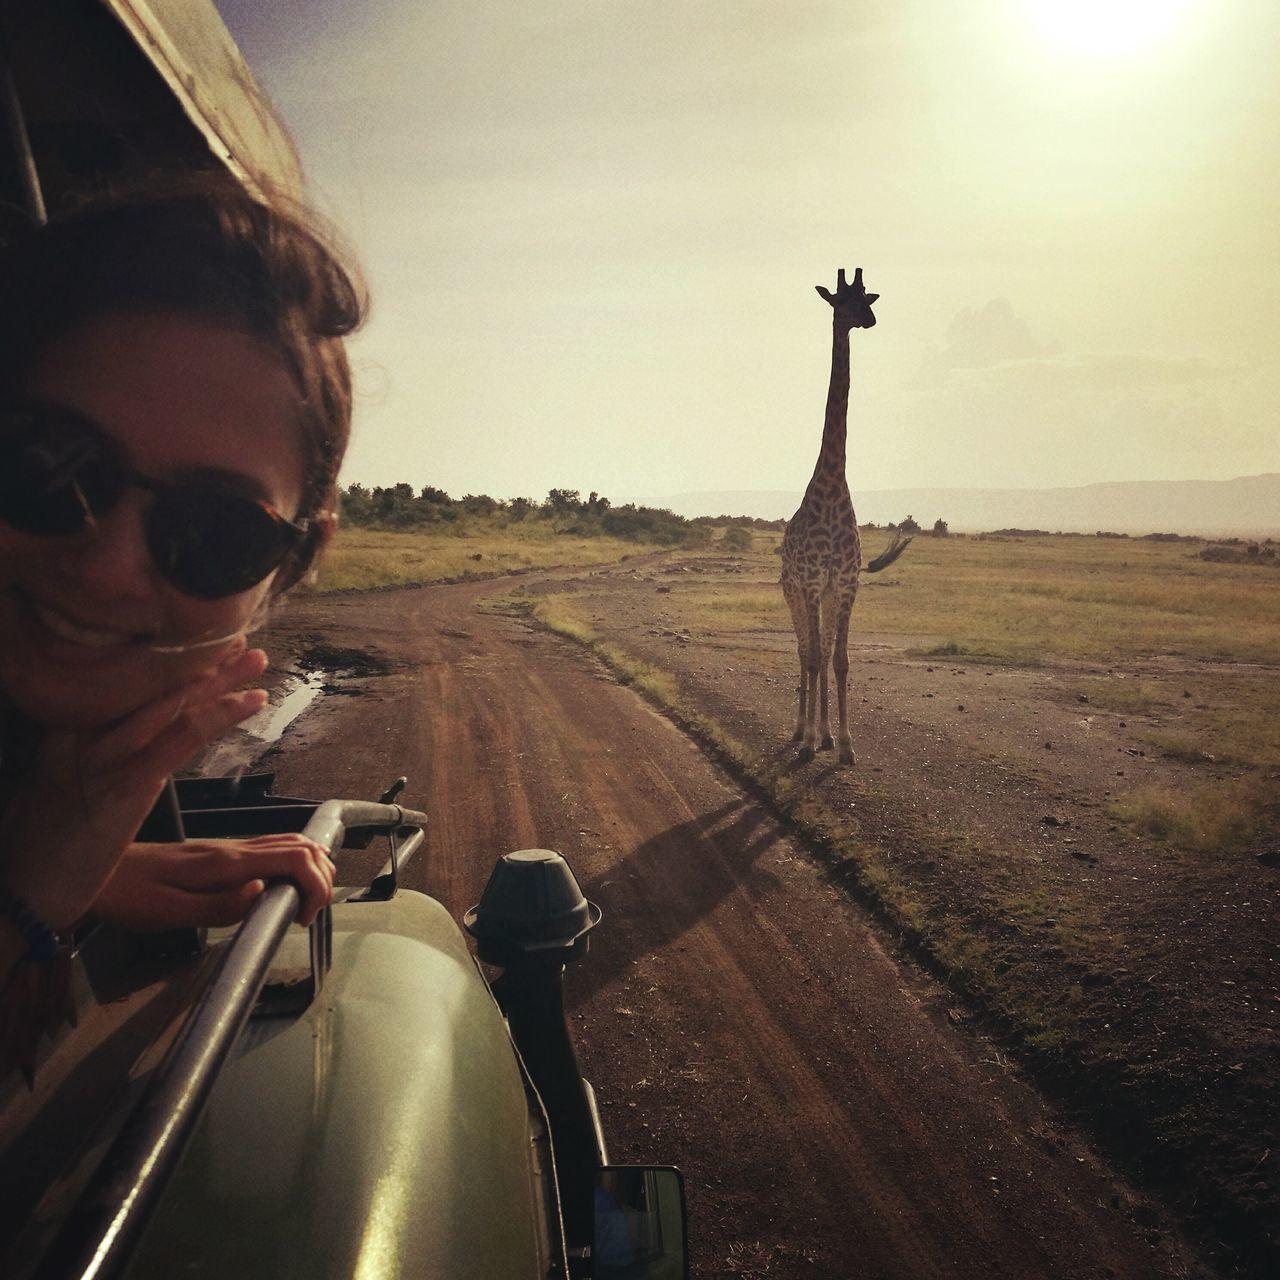 Rural Scene Landscape Outdoors Day Sky Nature Mammal Safari Animals Travel Giraffe